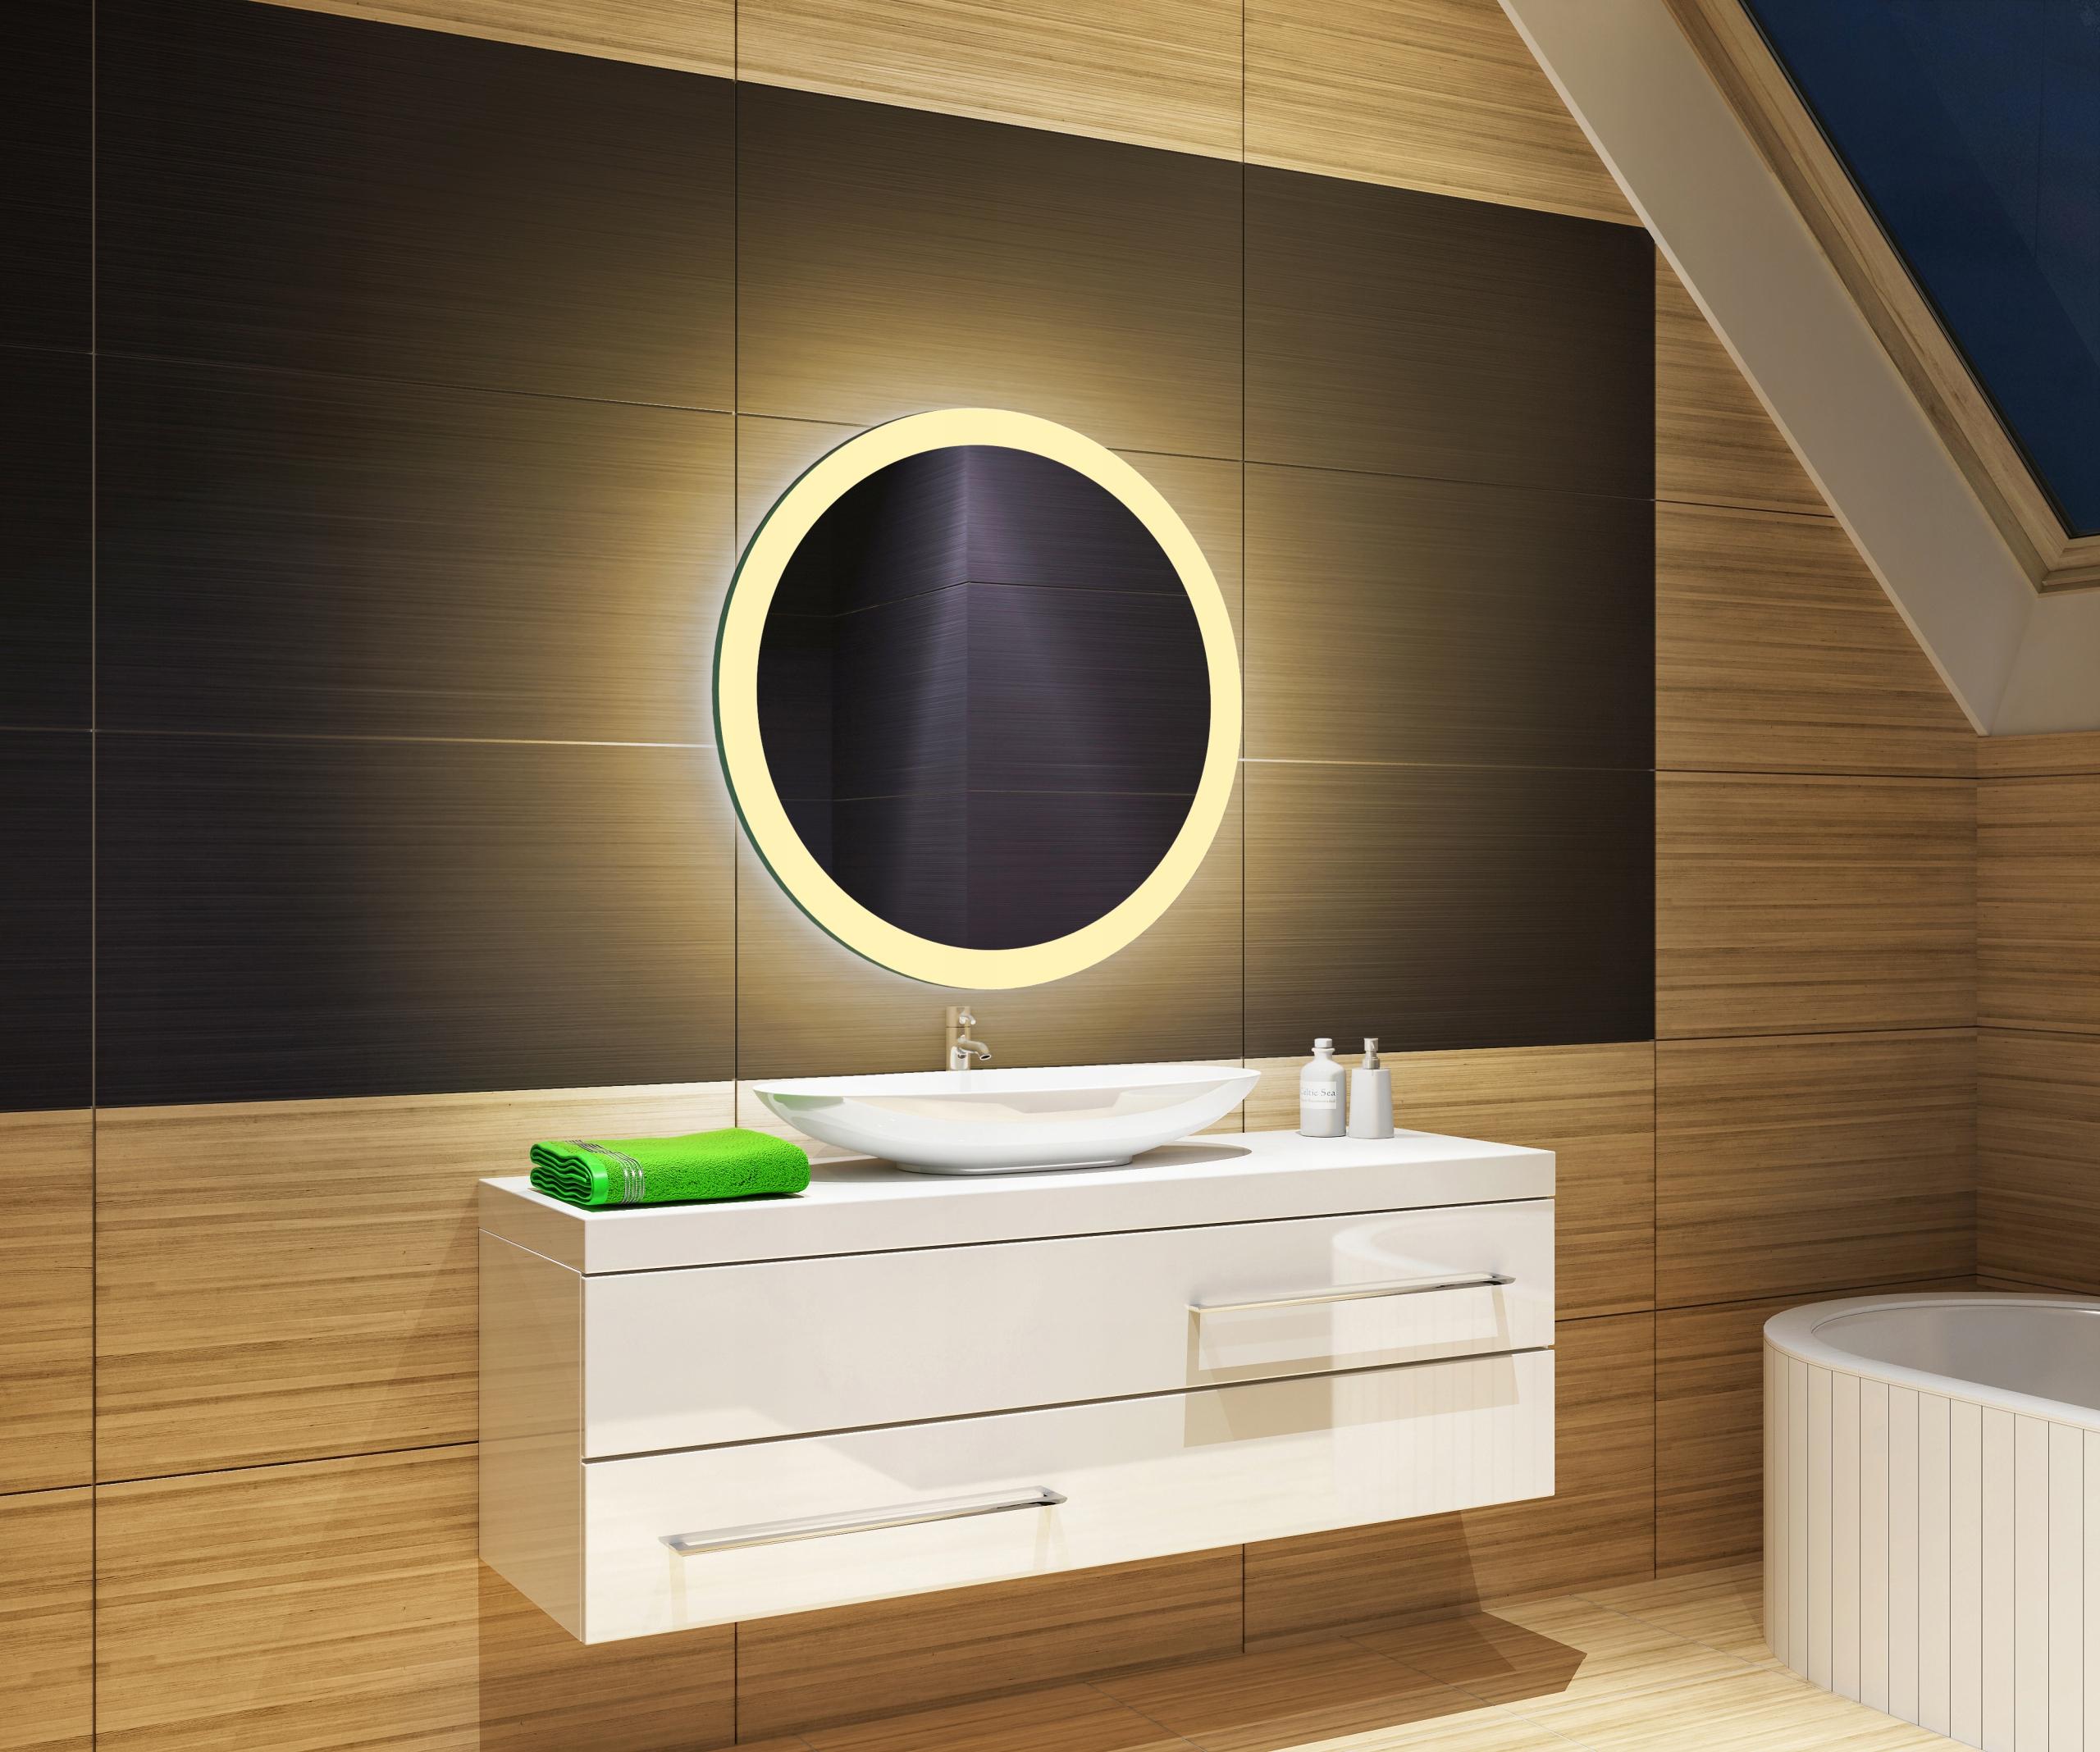 LED zrkadlo 60x60, okrúhle, teplé biele